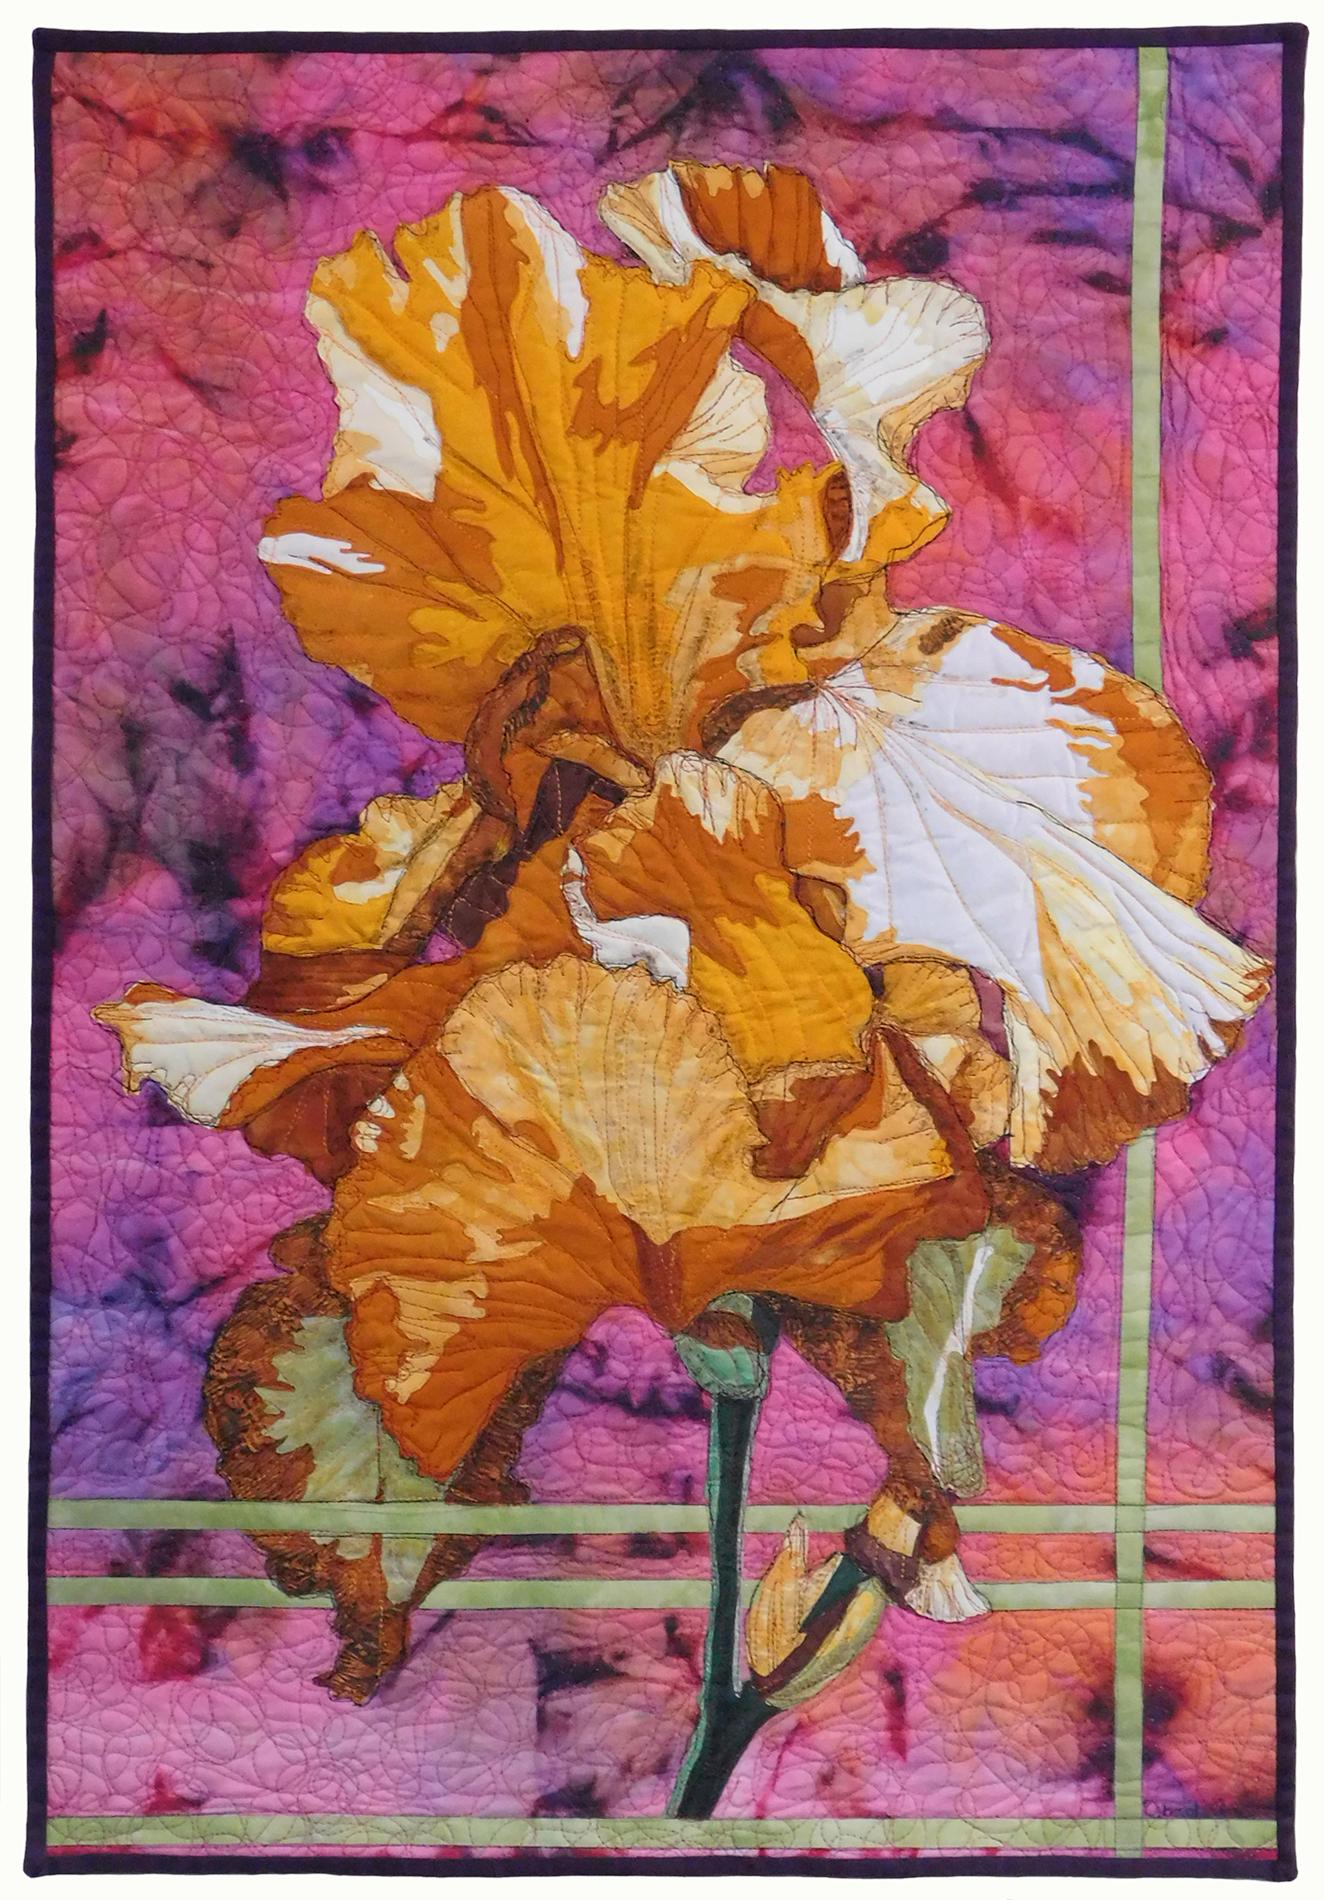 Deborah Ann, Golden Iris, hand-dyed fabrics